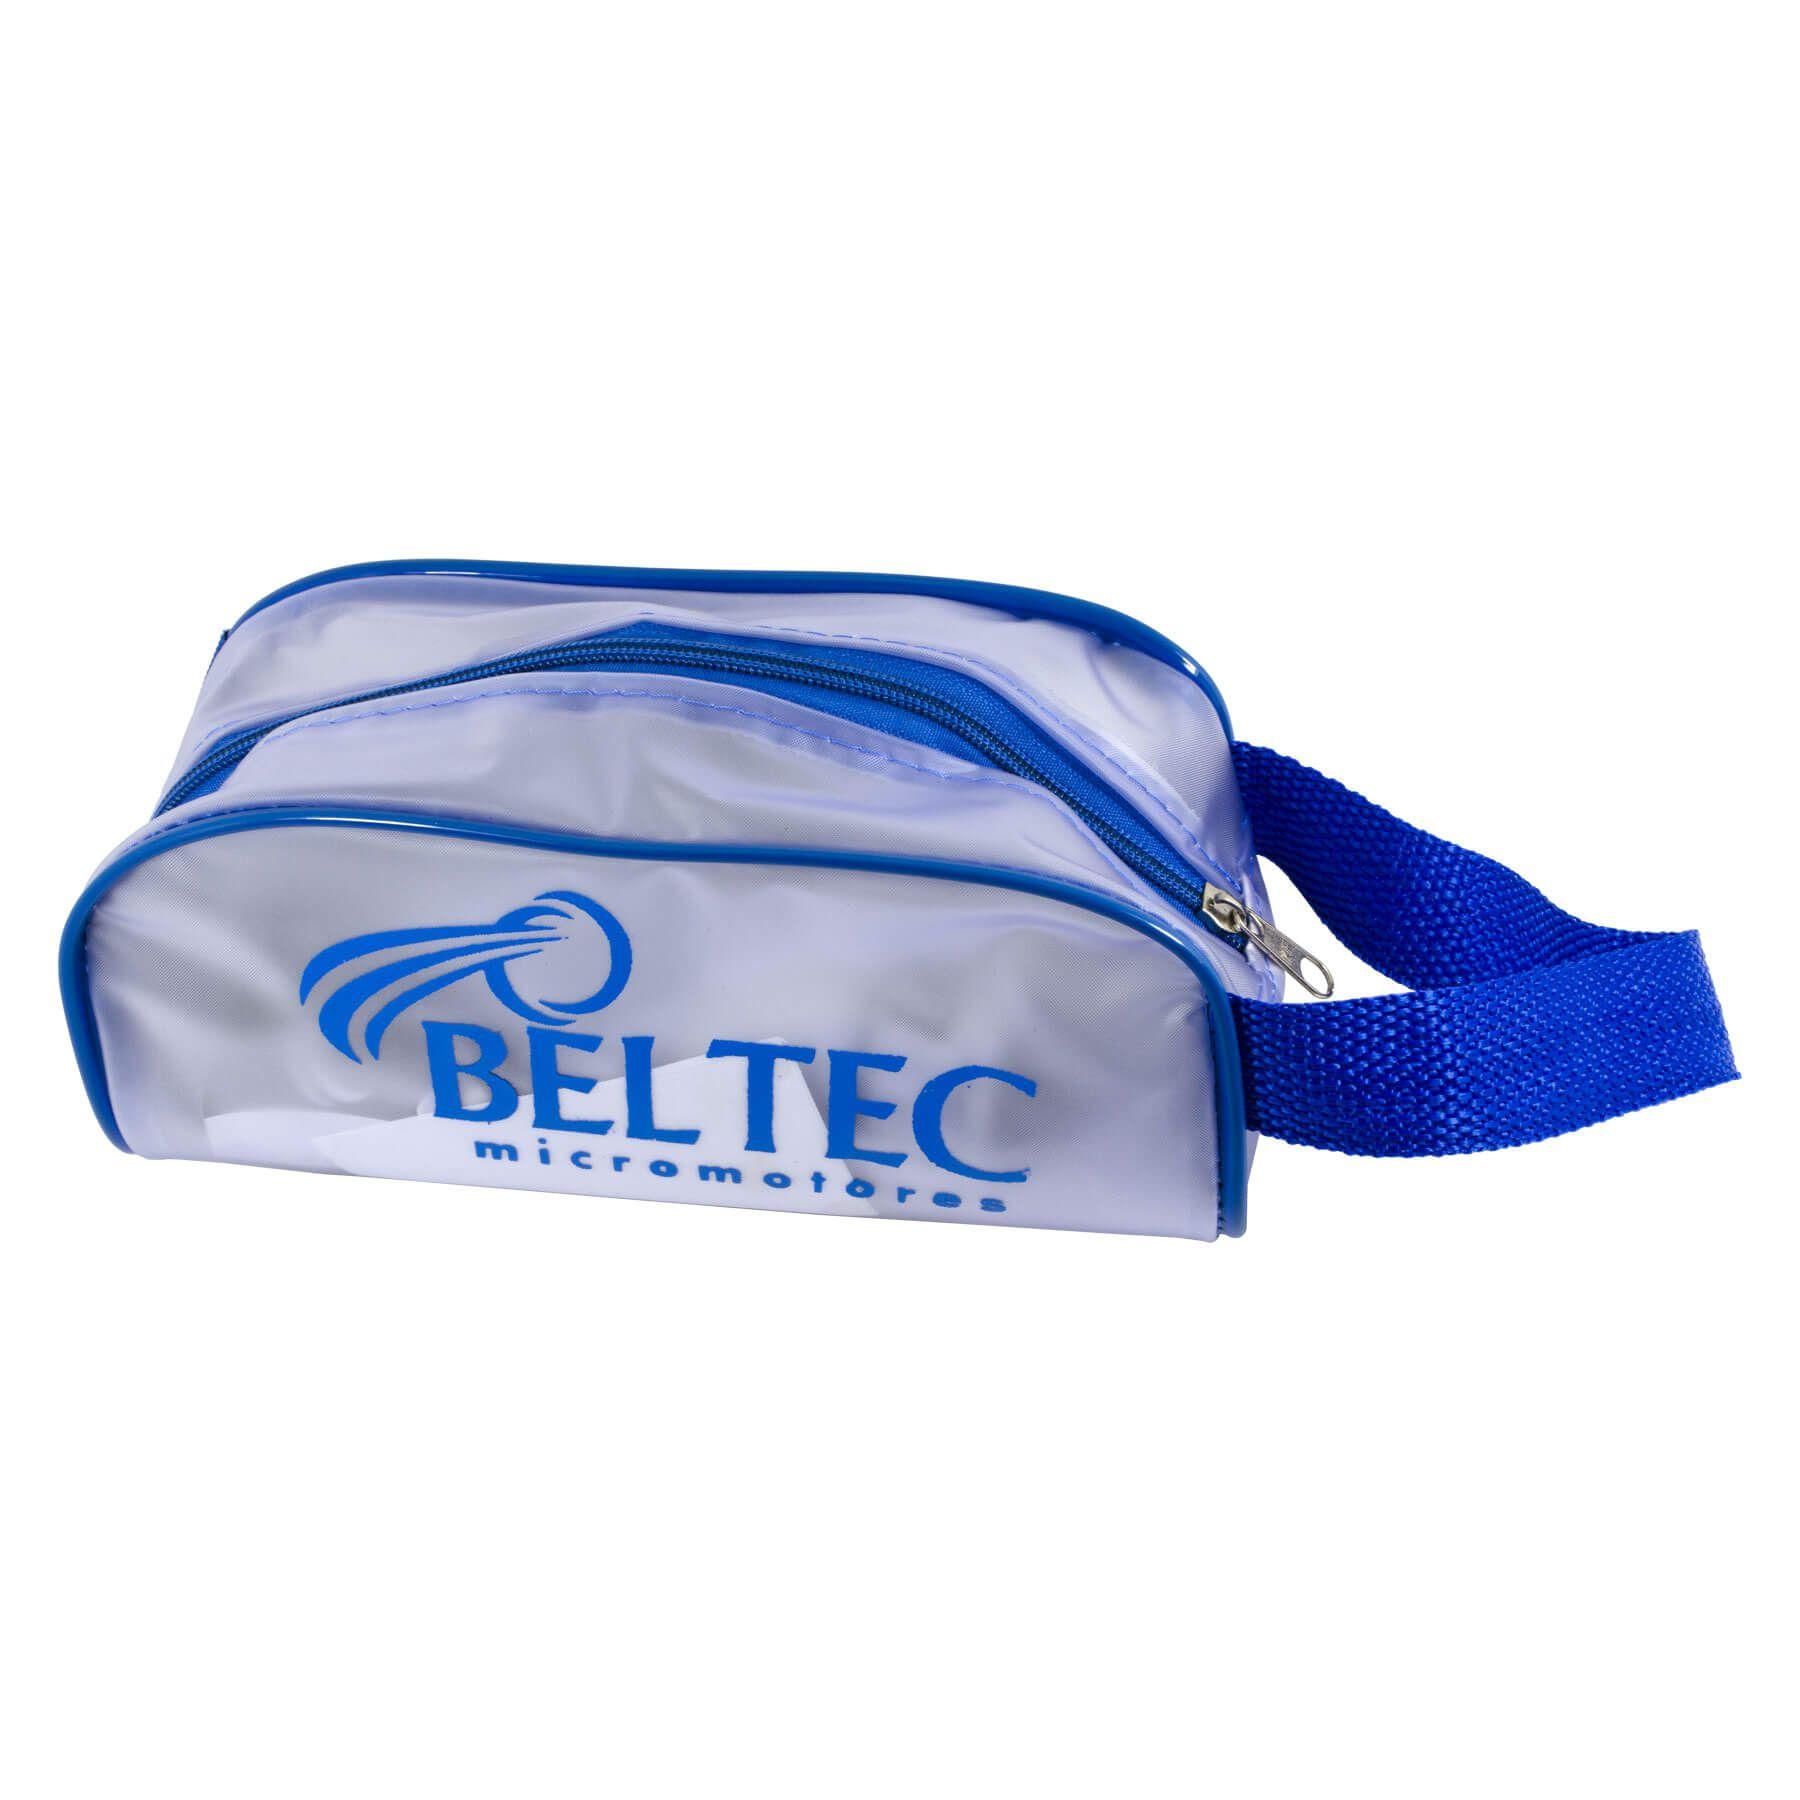 Micromotor Beltec LB50